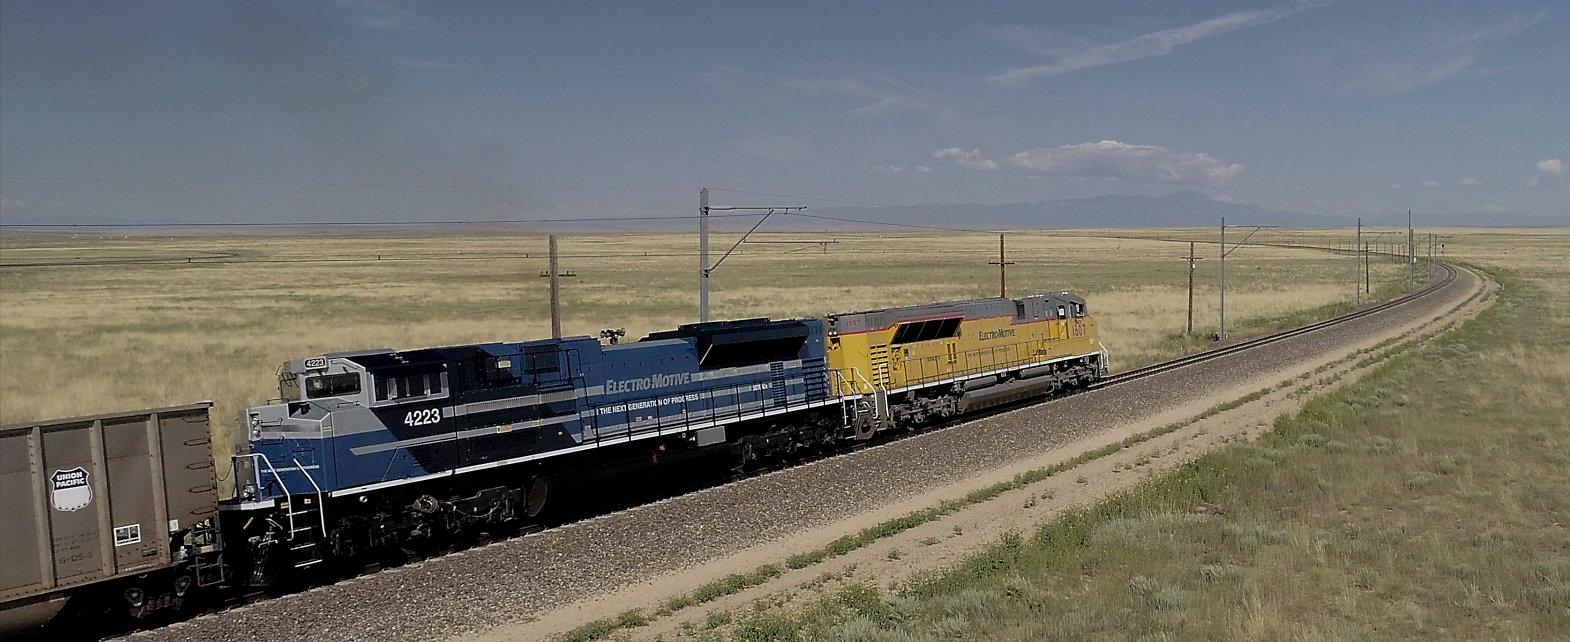 Locomotive Remaufacturing